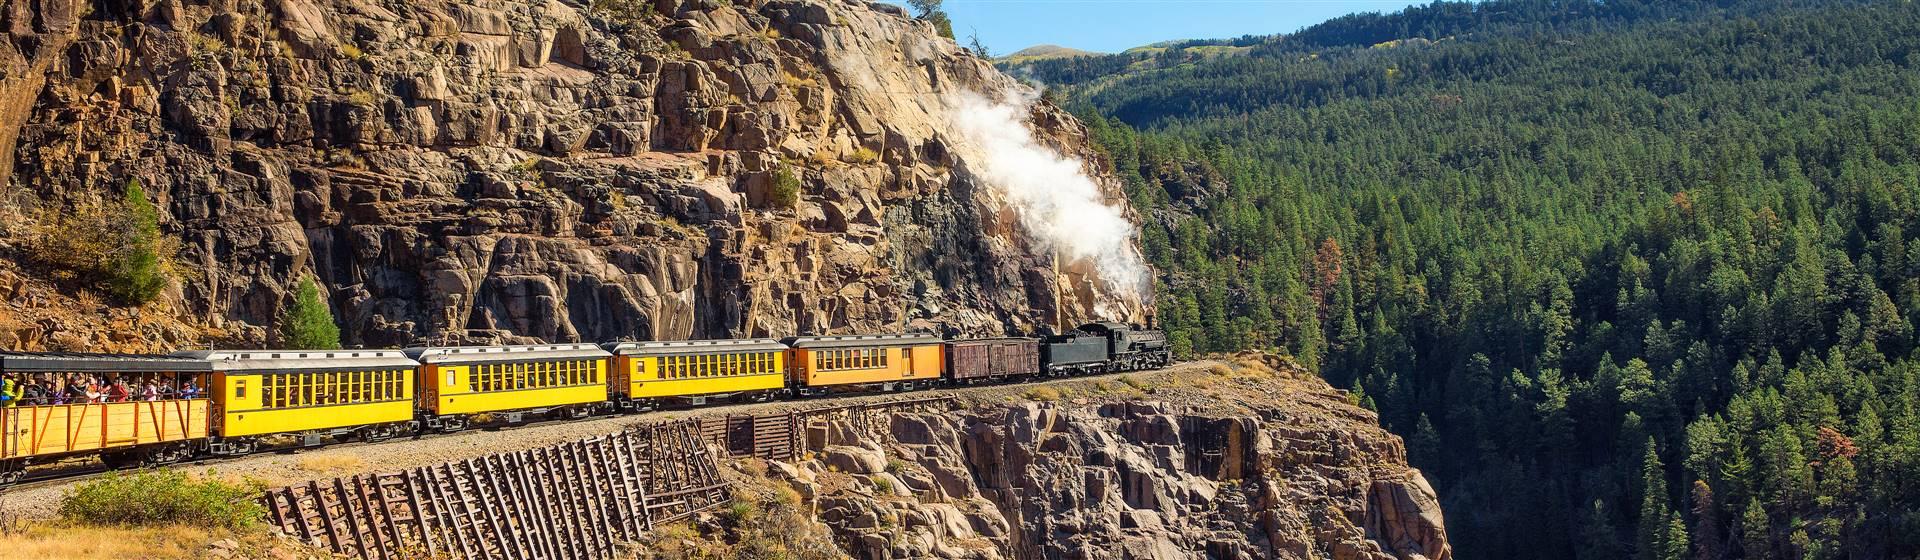 "<img src=""coloradosteam-shutterstock.jpeg"" alt=""Colorado Steam""/>"